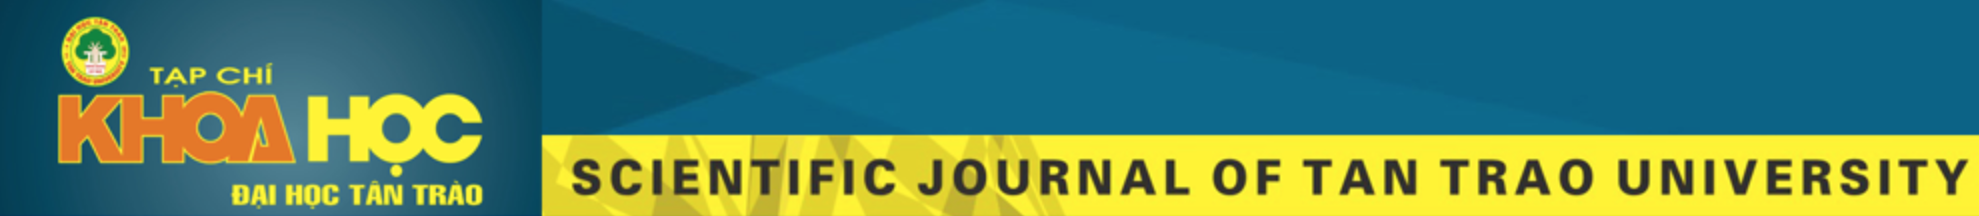 Scientific Journal of Tan Trao University Logo